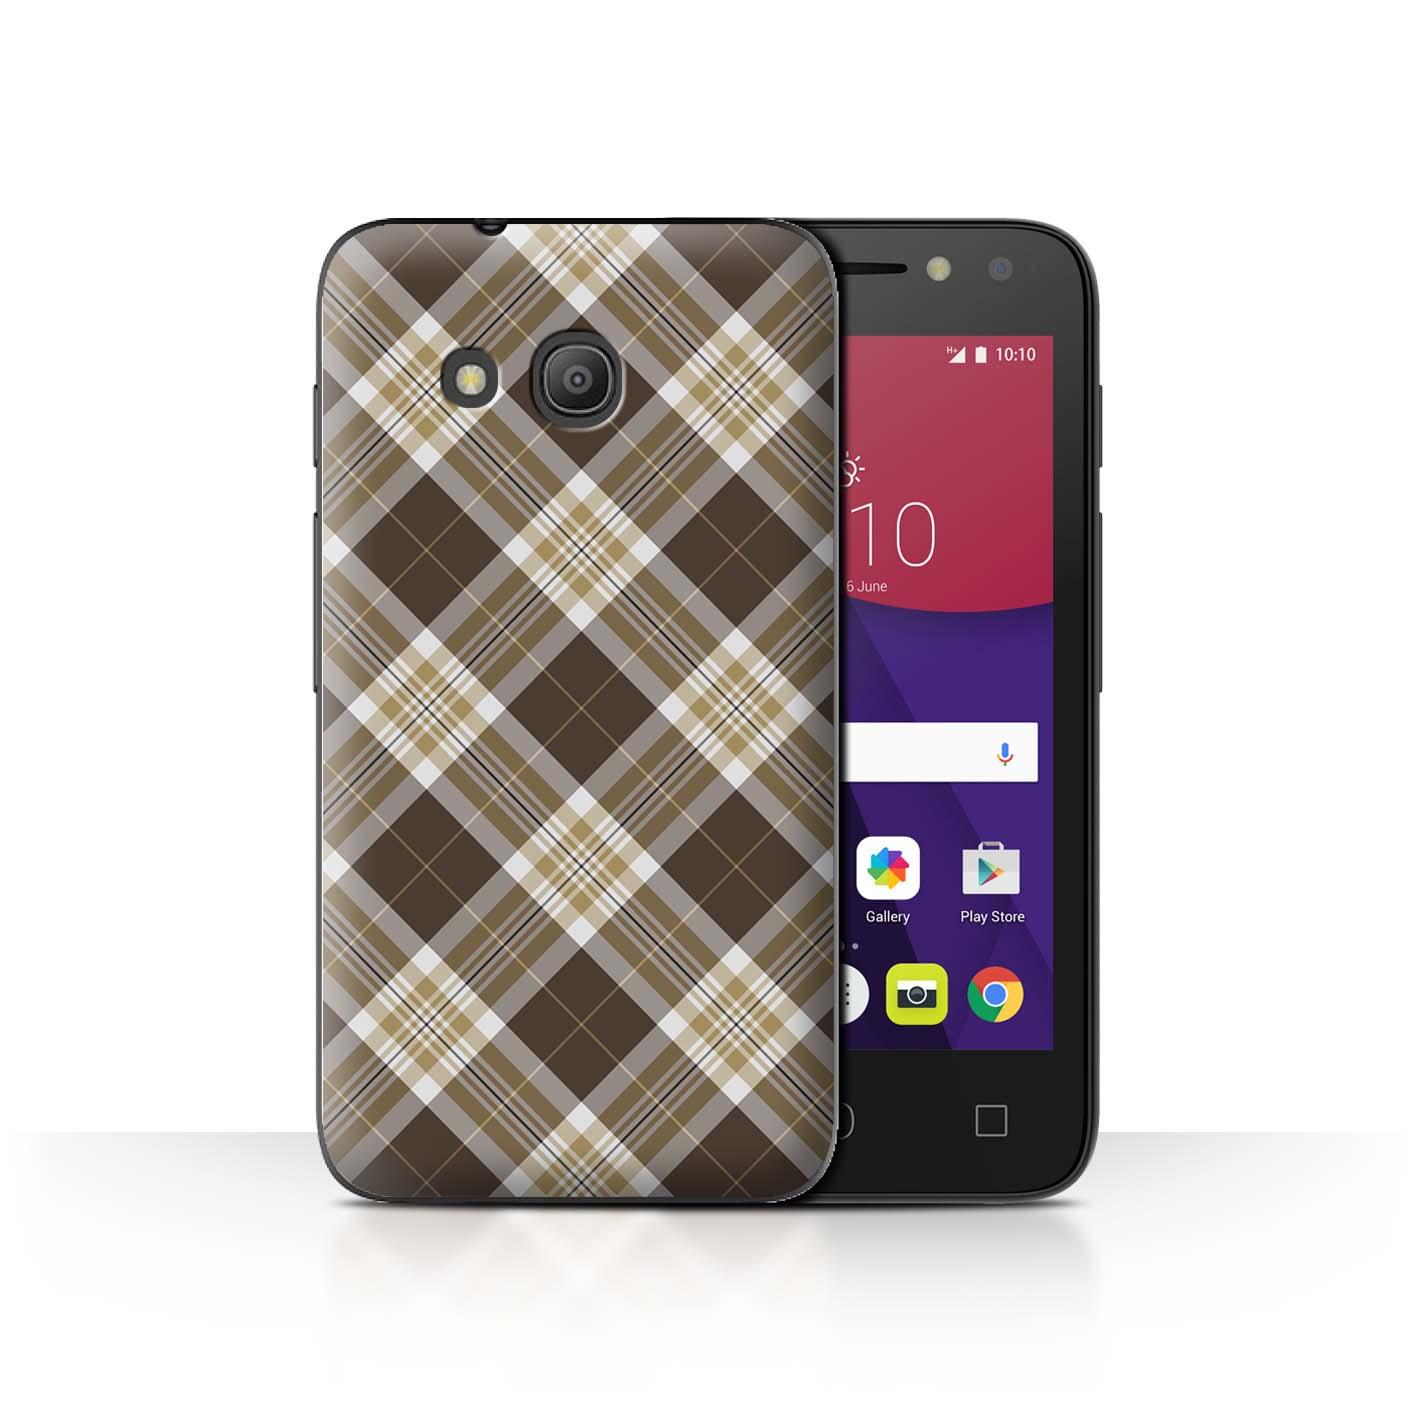 STUFF4-Back-Case-Cover-Skin-for-Alcatel-Pixi-4-4-034-Tartan-Picnic-Pattern